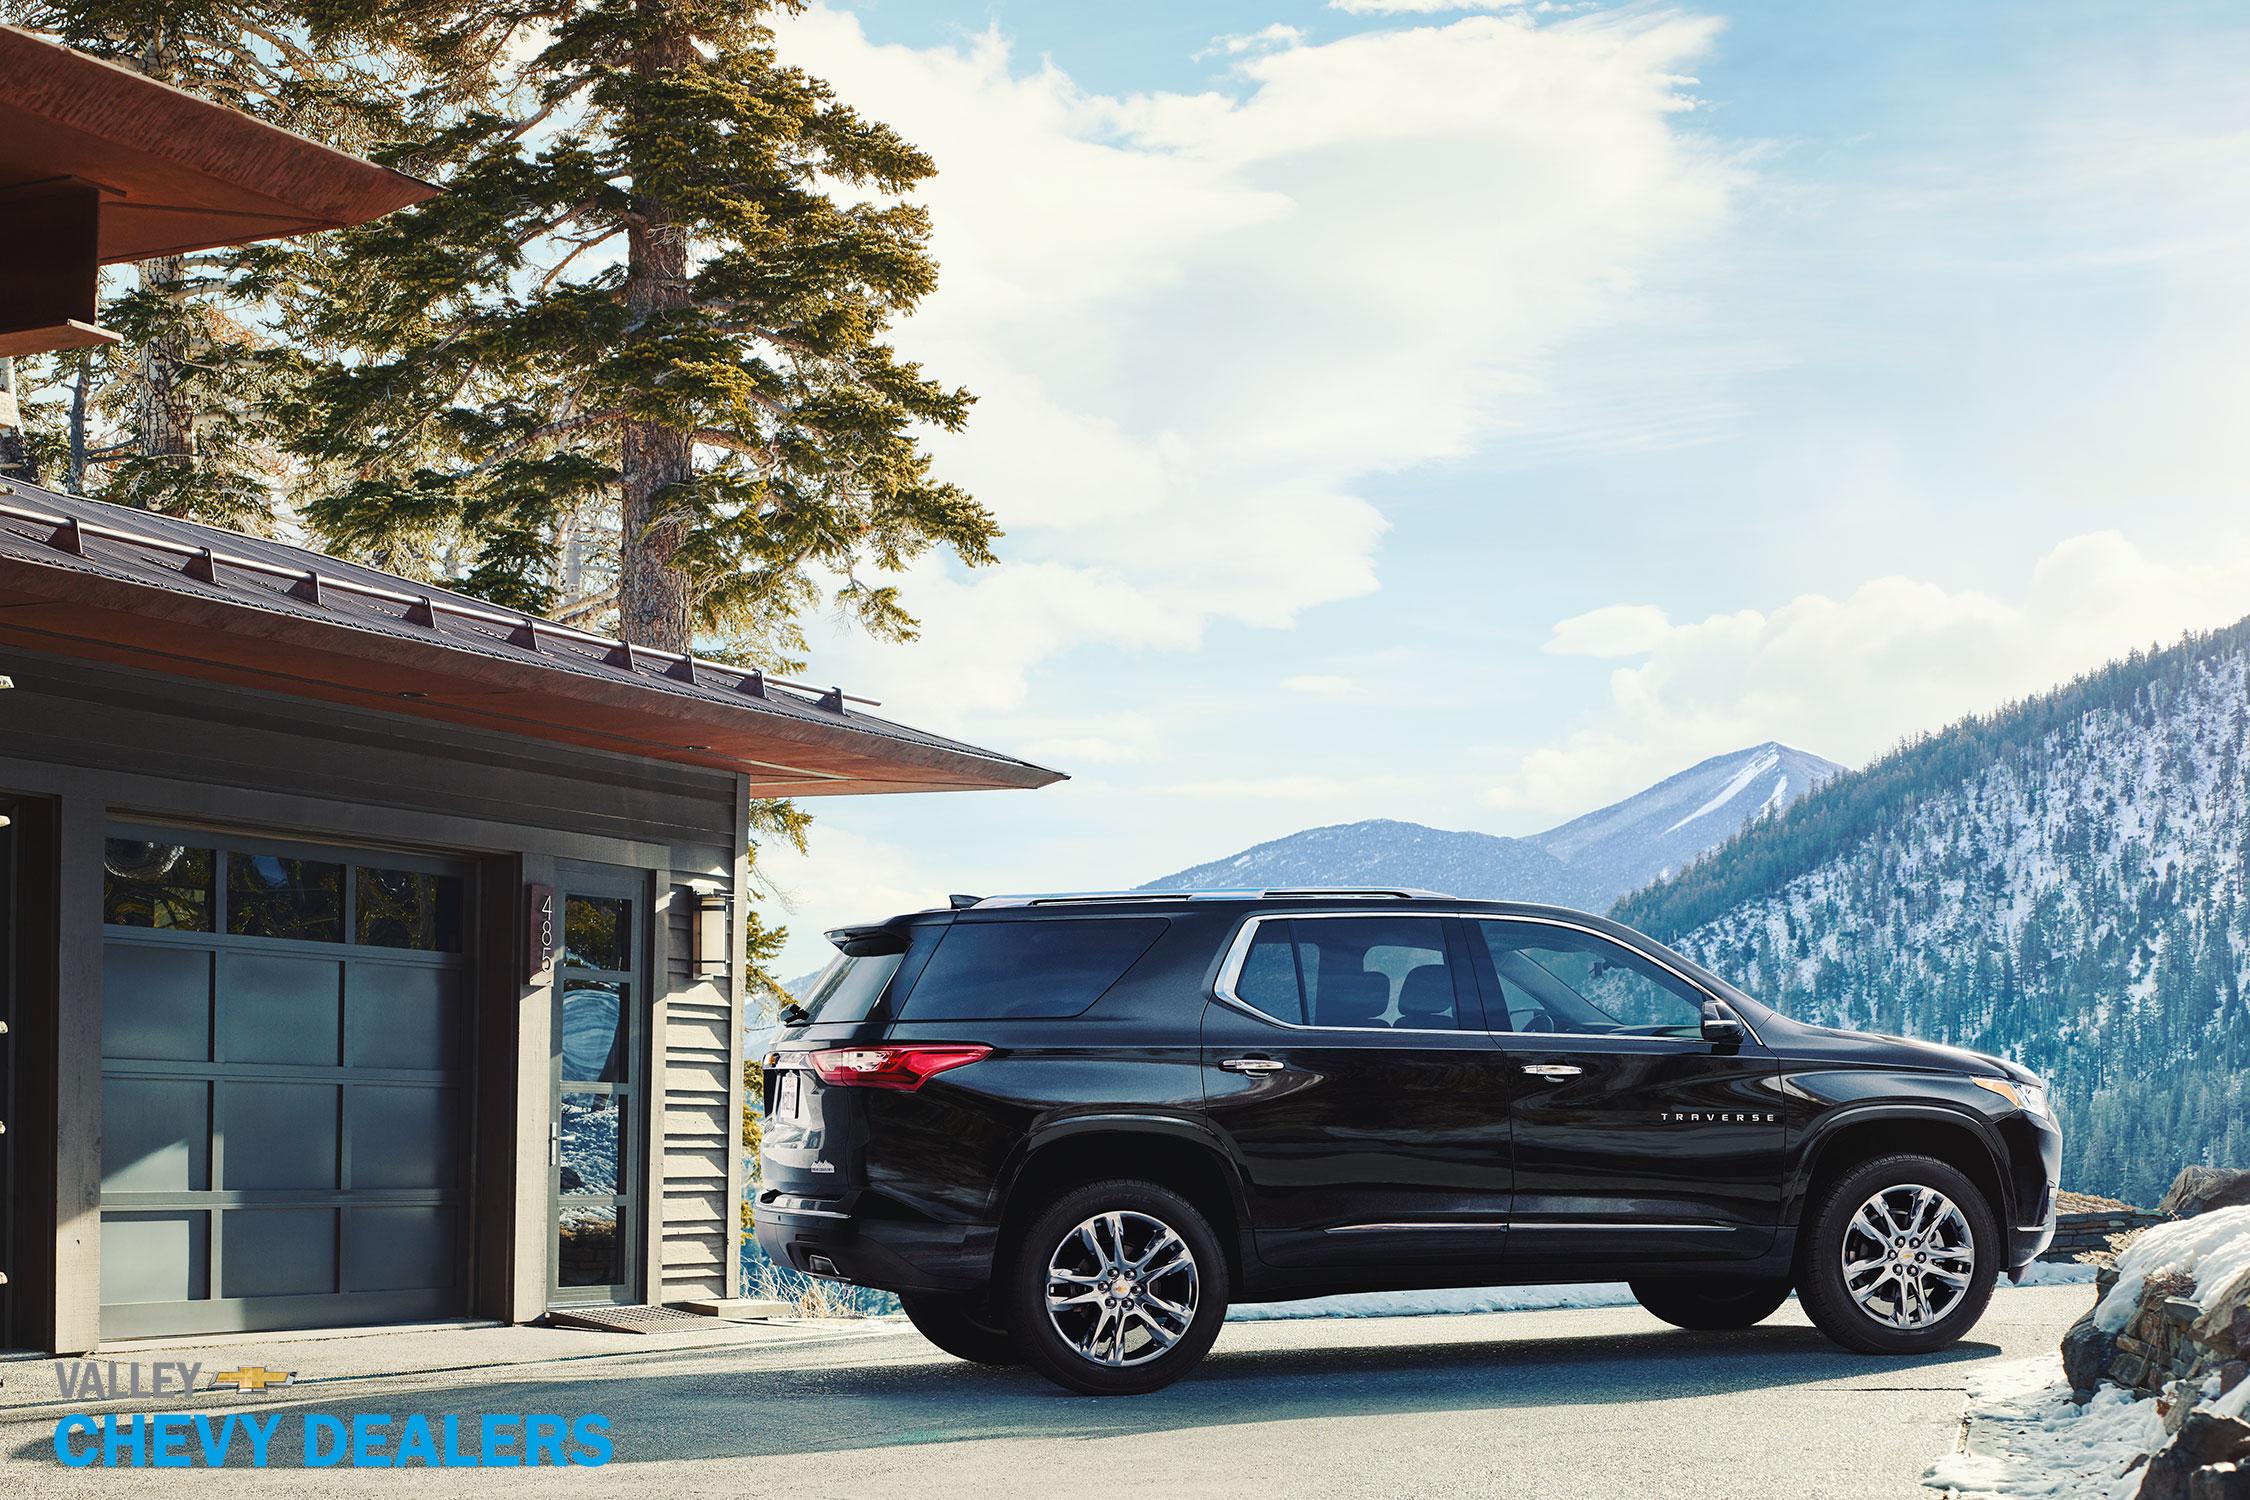 Valley Chevy - 2017 Chevrolet Traverse: Black SUV Exterior